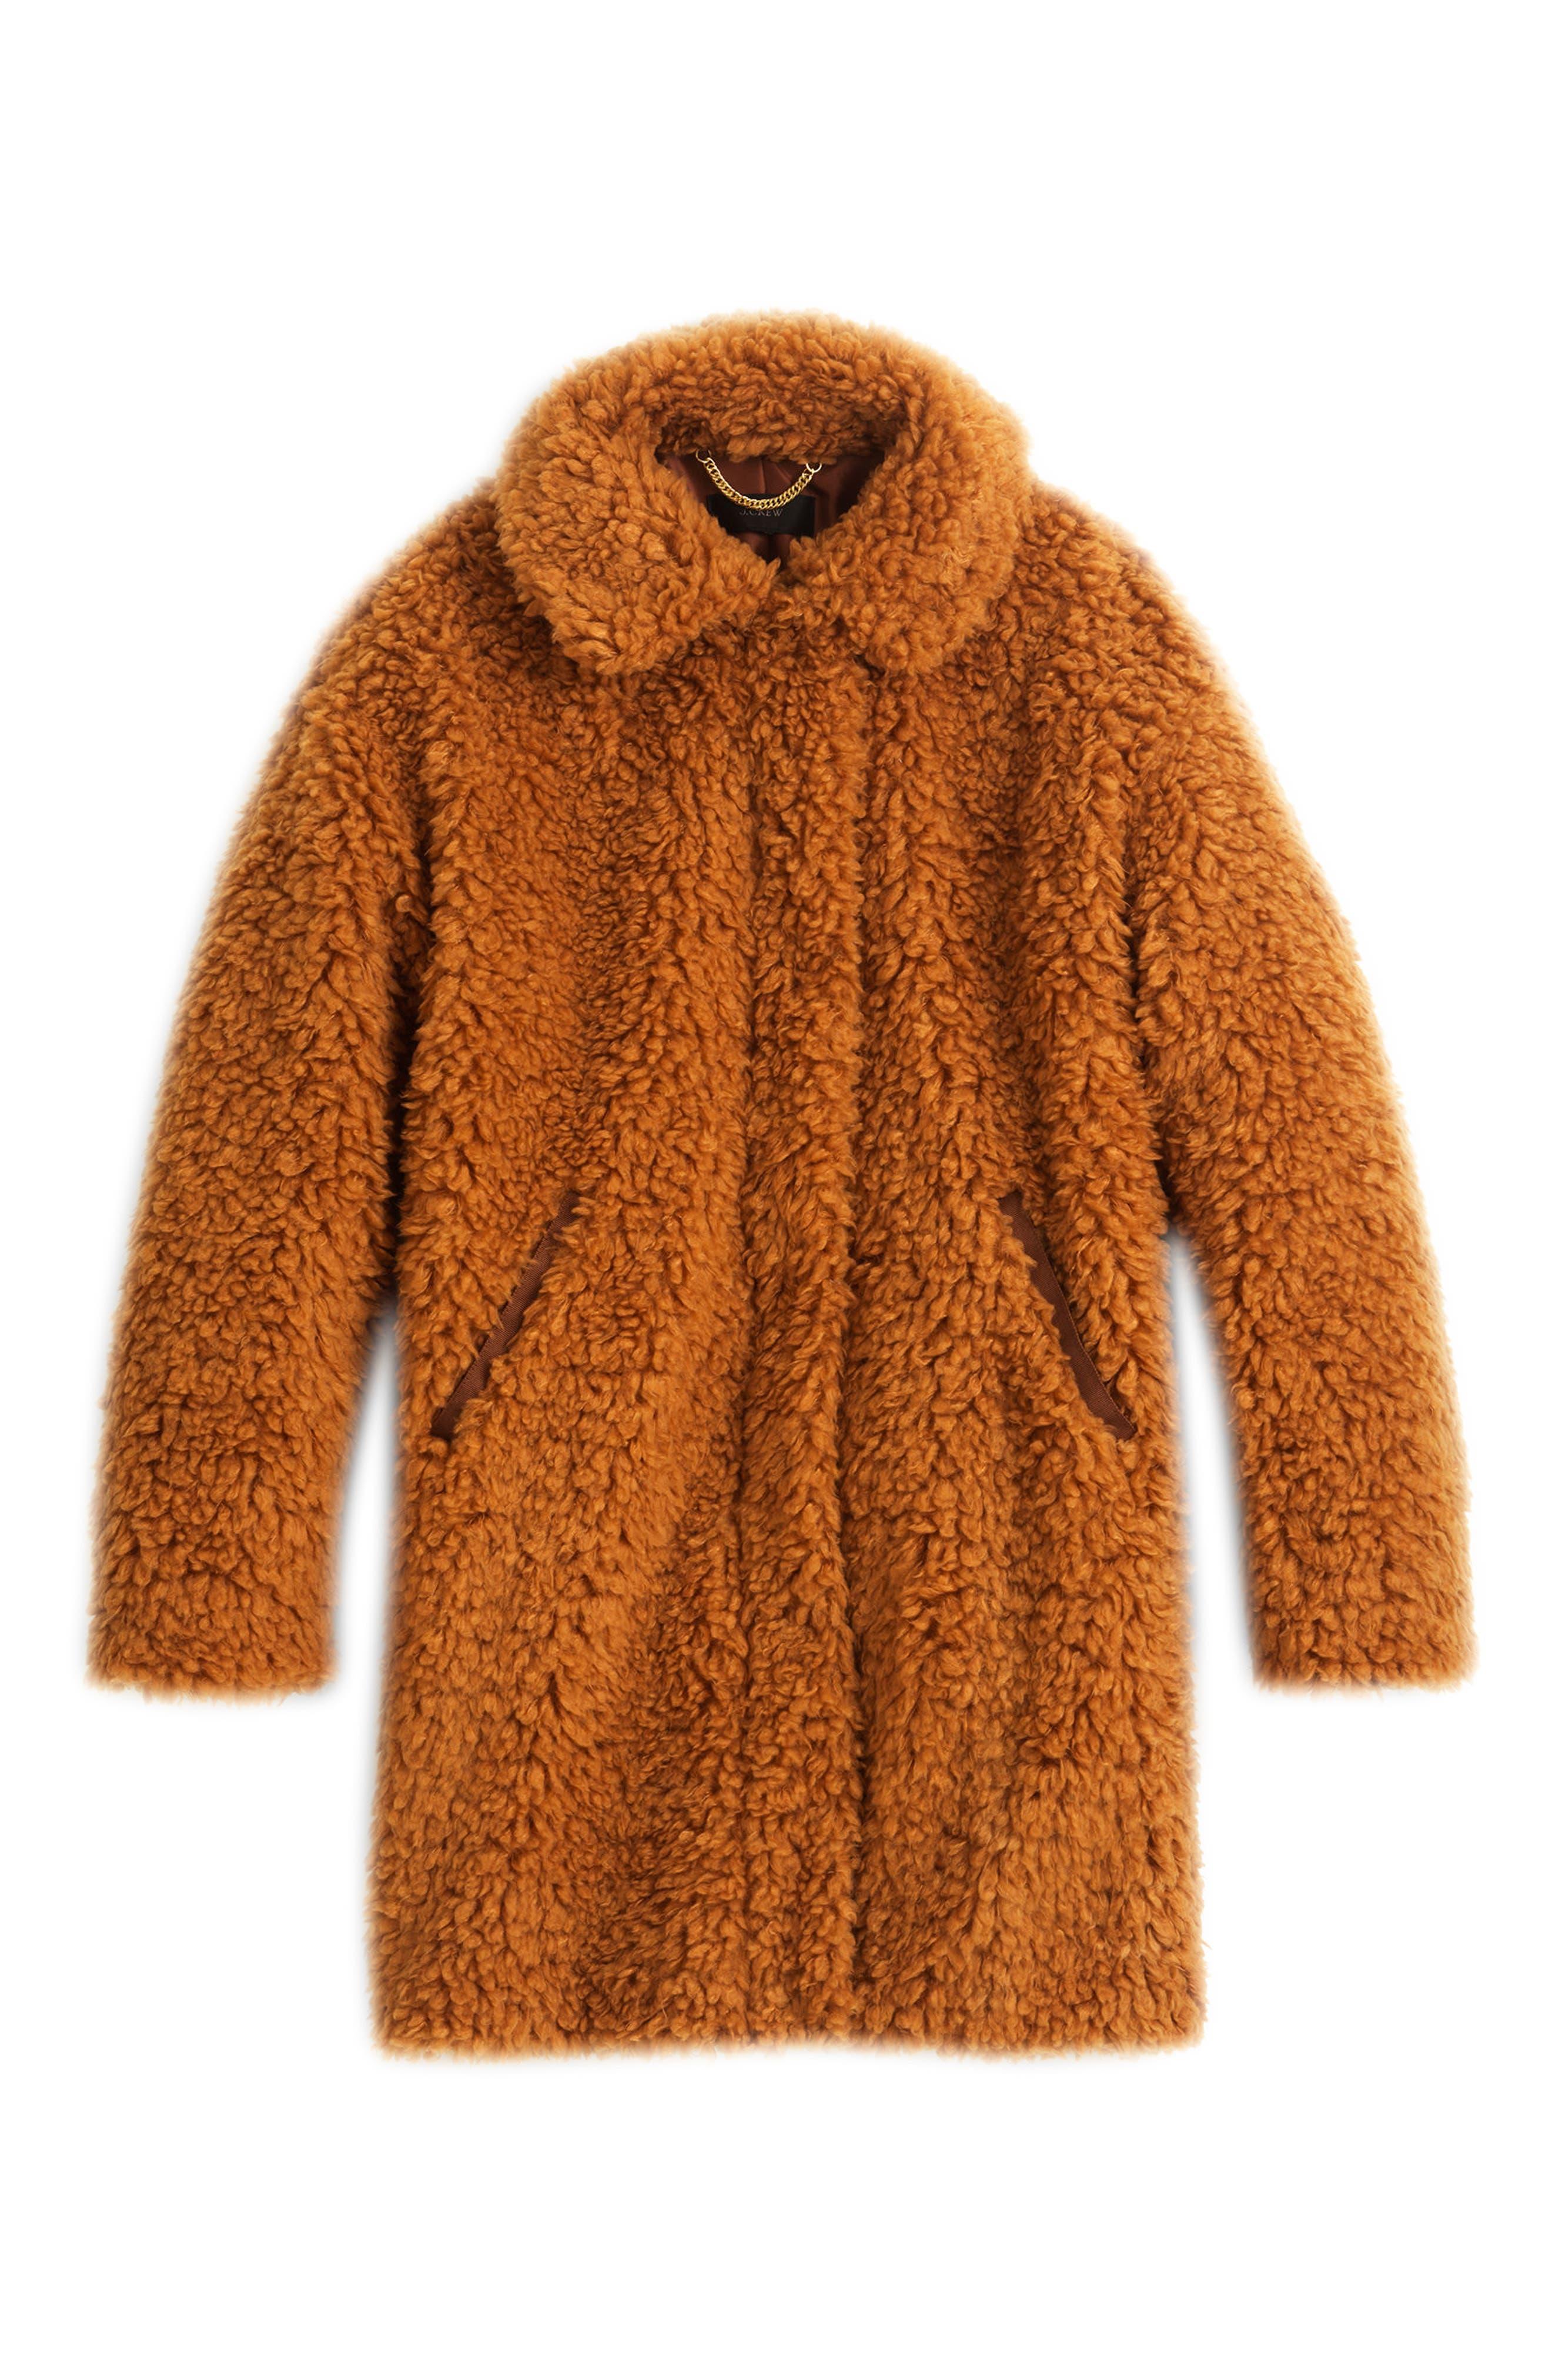 J.Crew Teddy Faux Fur Coat